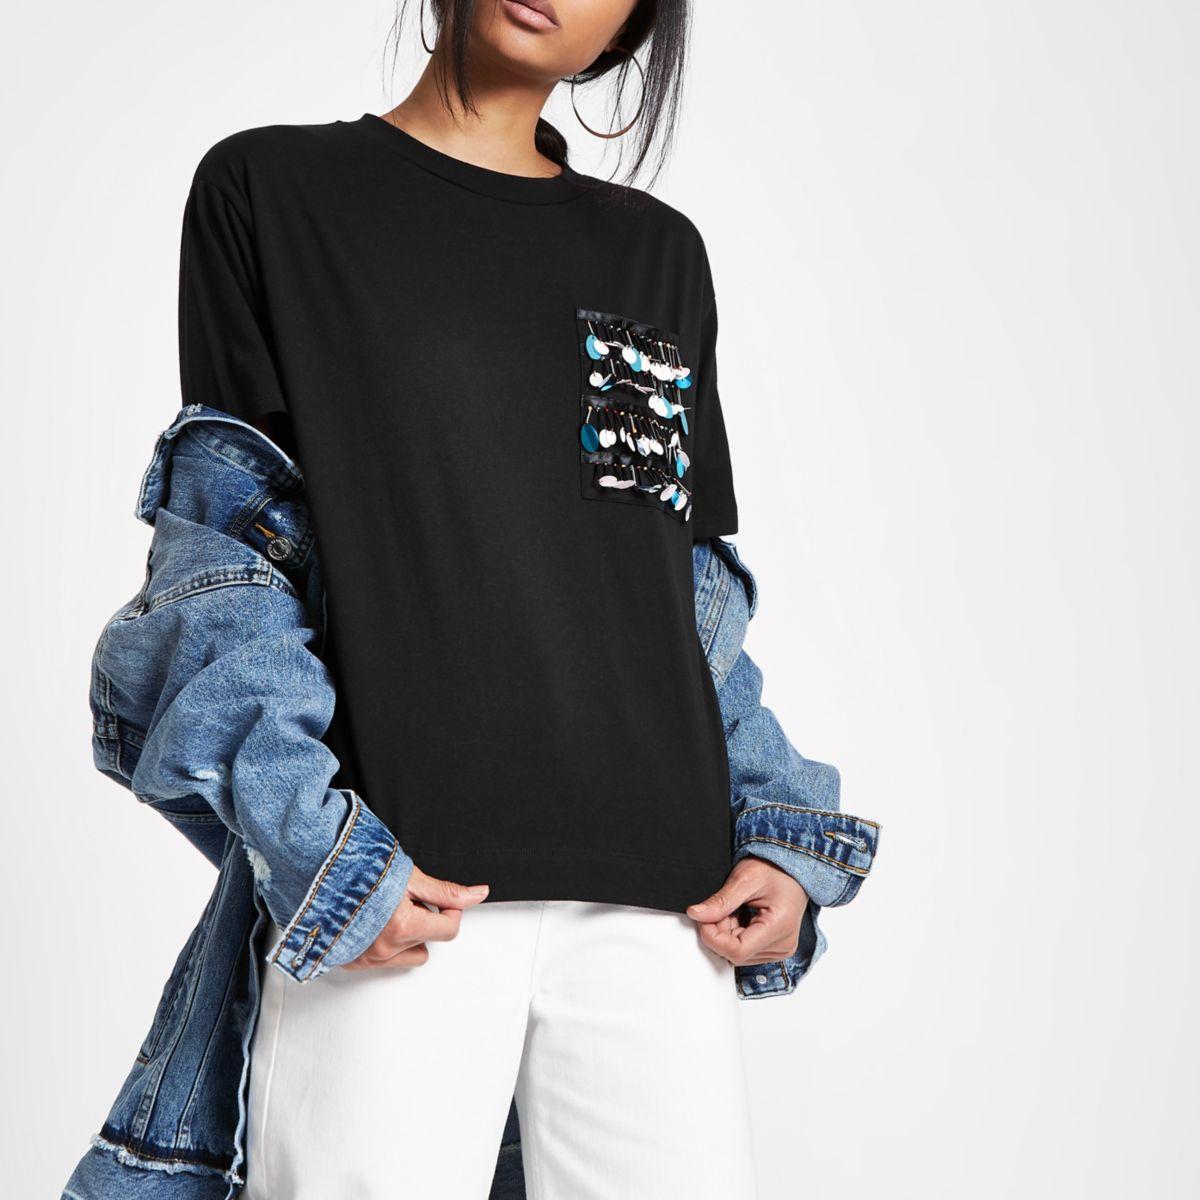 Schwarzes, paillettenverziertes T-Shirt